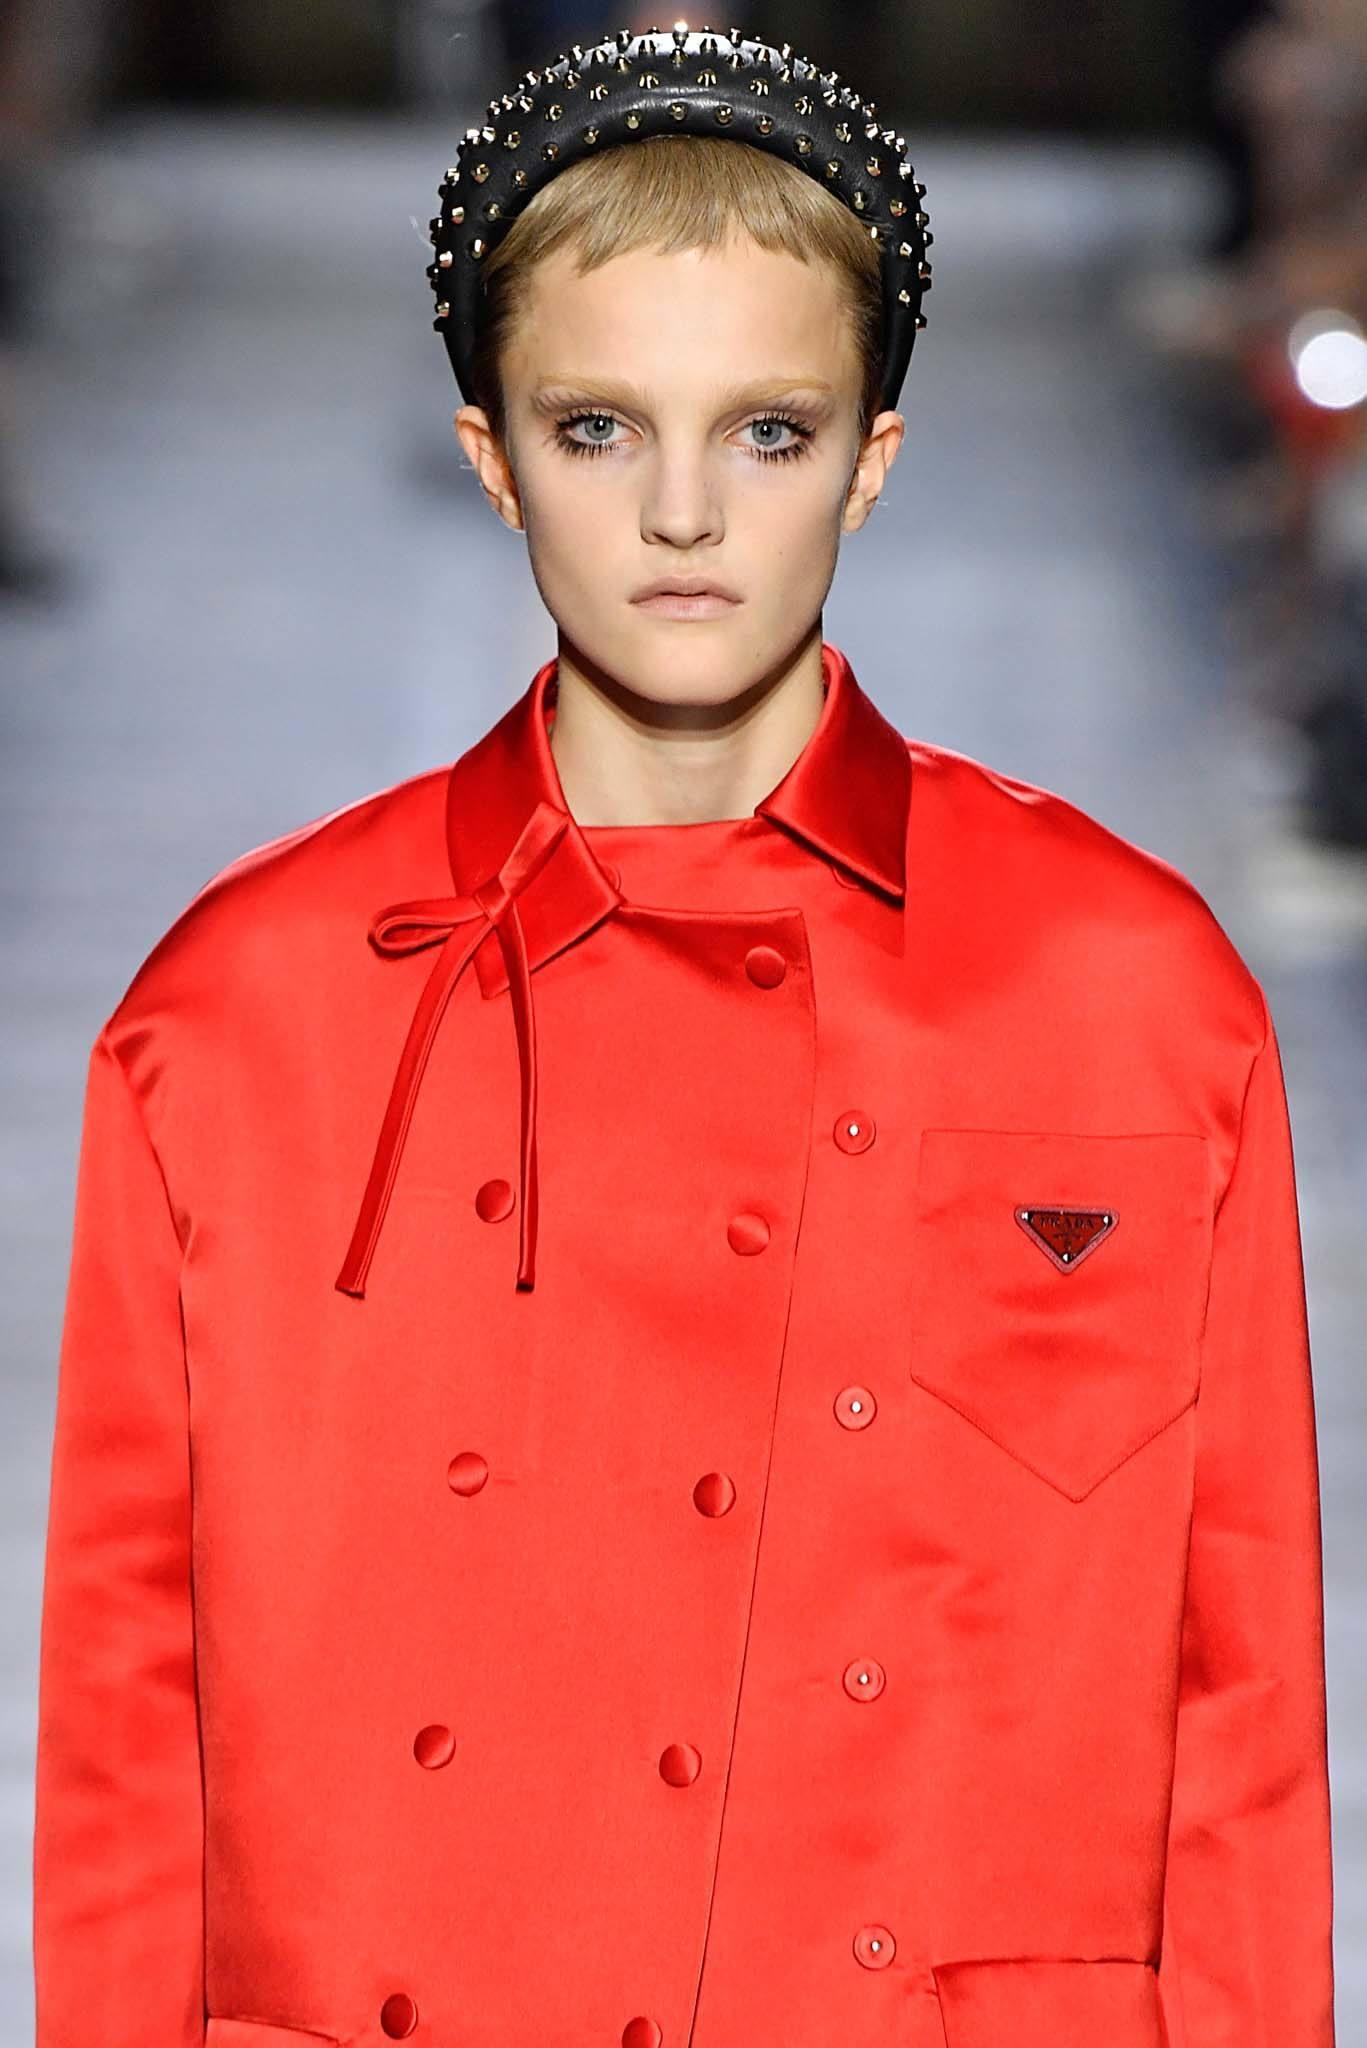 Short bangs: Model with blonde hair wearing a large headband with micro bangs at Prada.